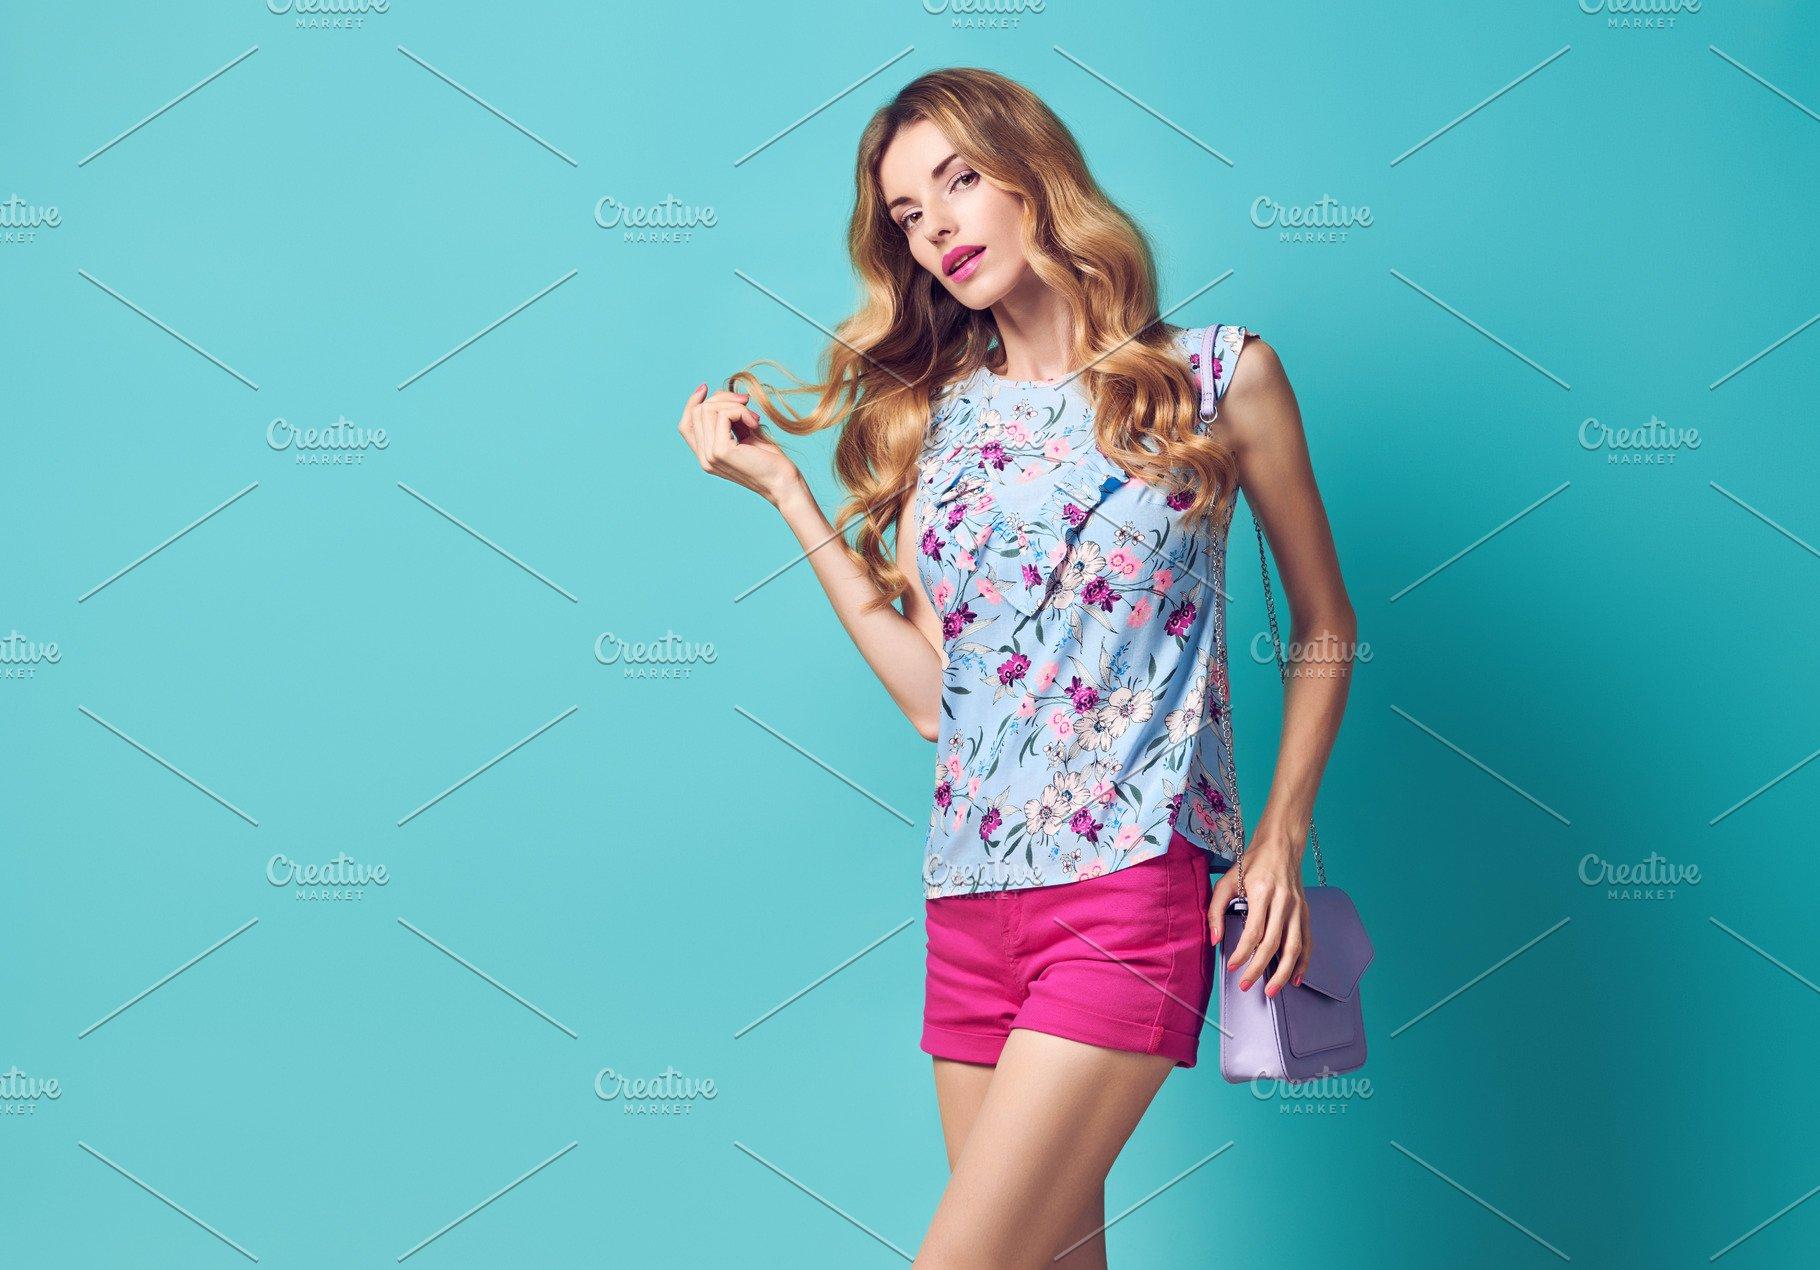 dc7a82c77b1cd Sensual Blonde model woman ~ Beauty   Fashion Photos ~ Creative Market